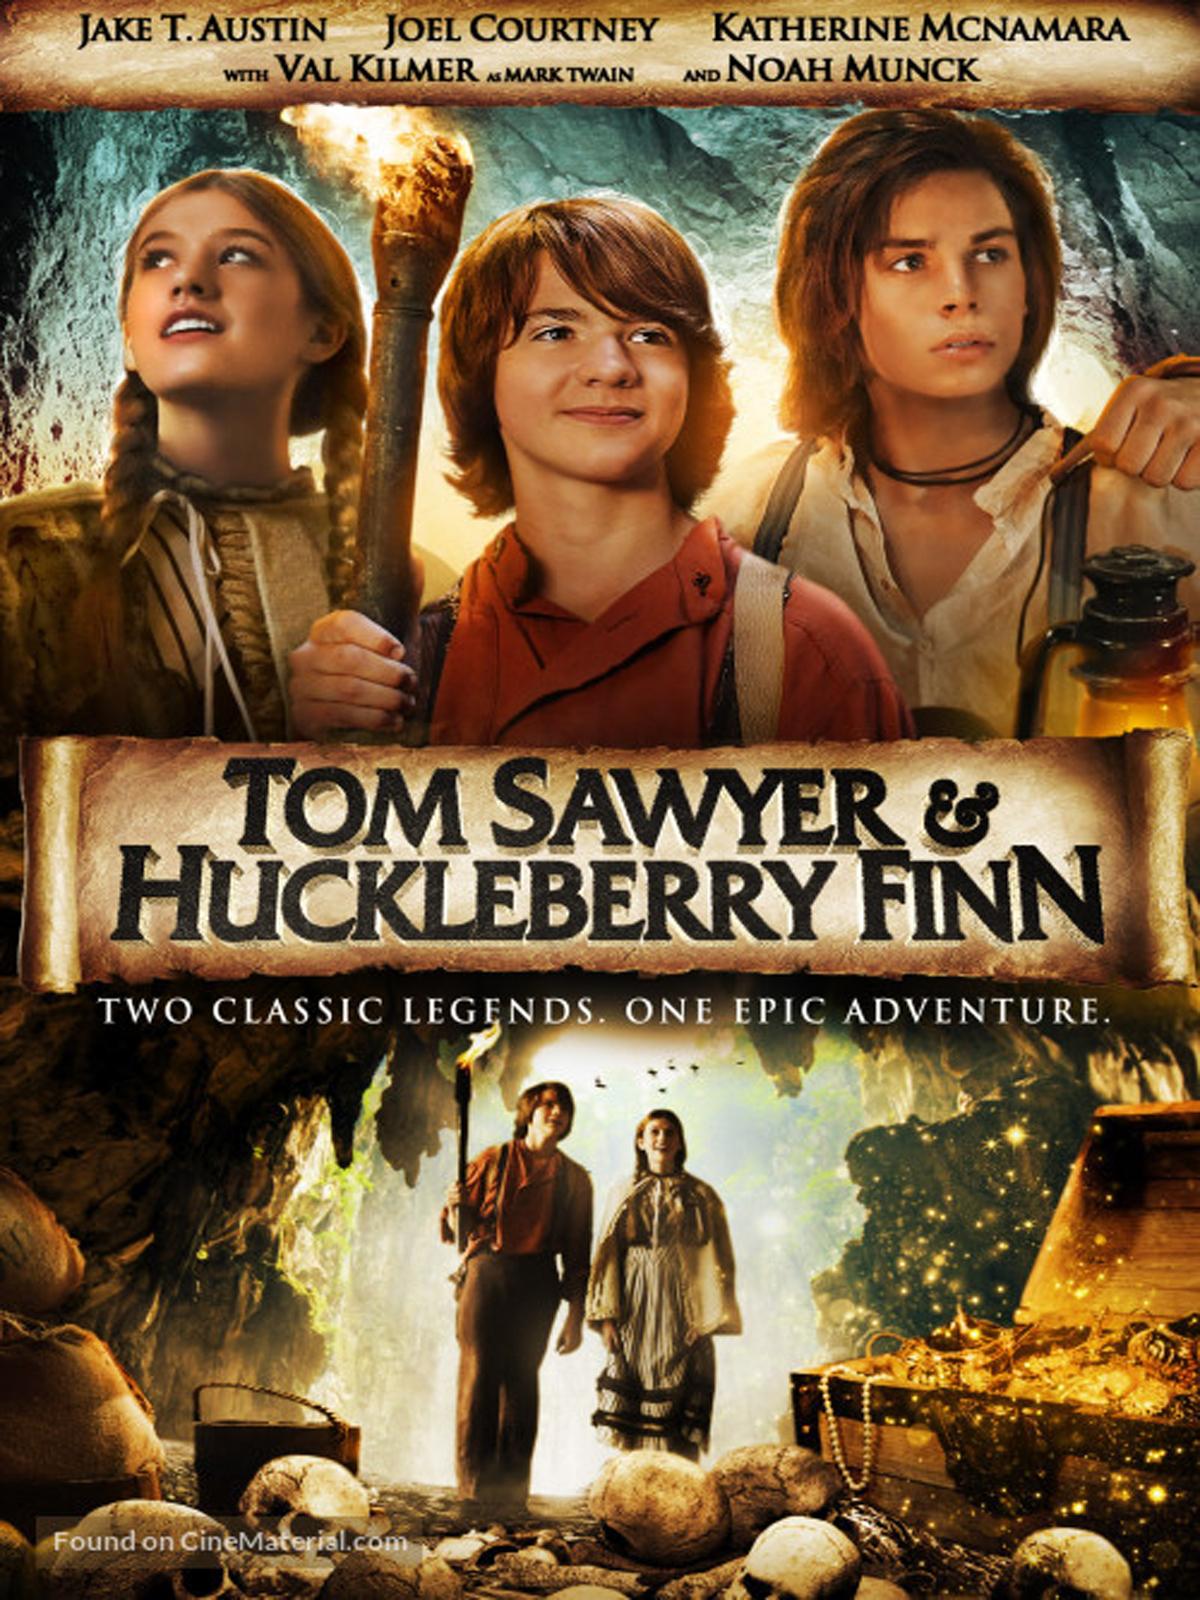 Tom Sawyer & Huckleberry Finn 2014